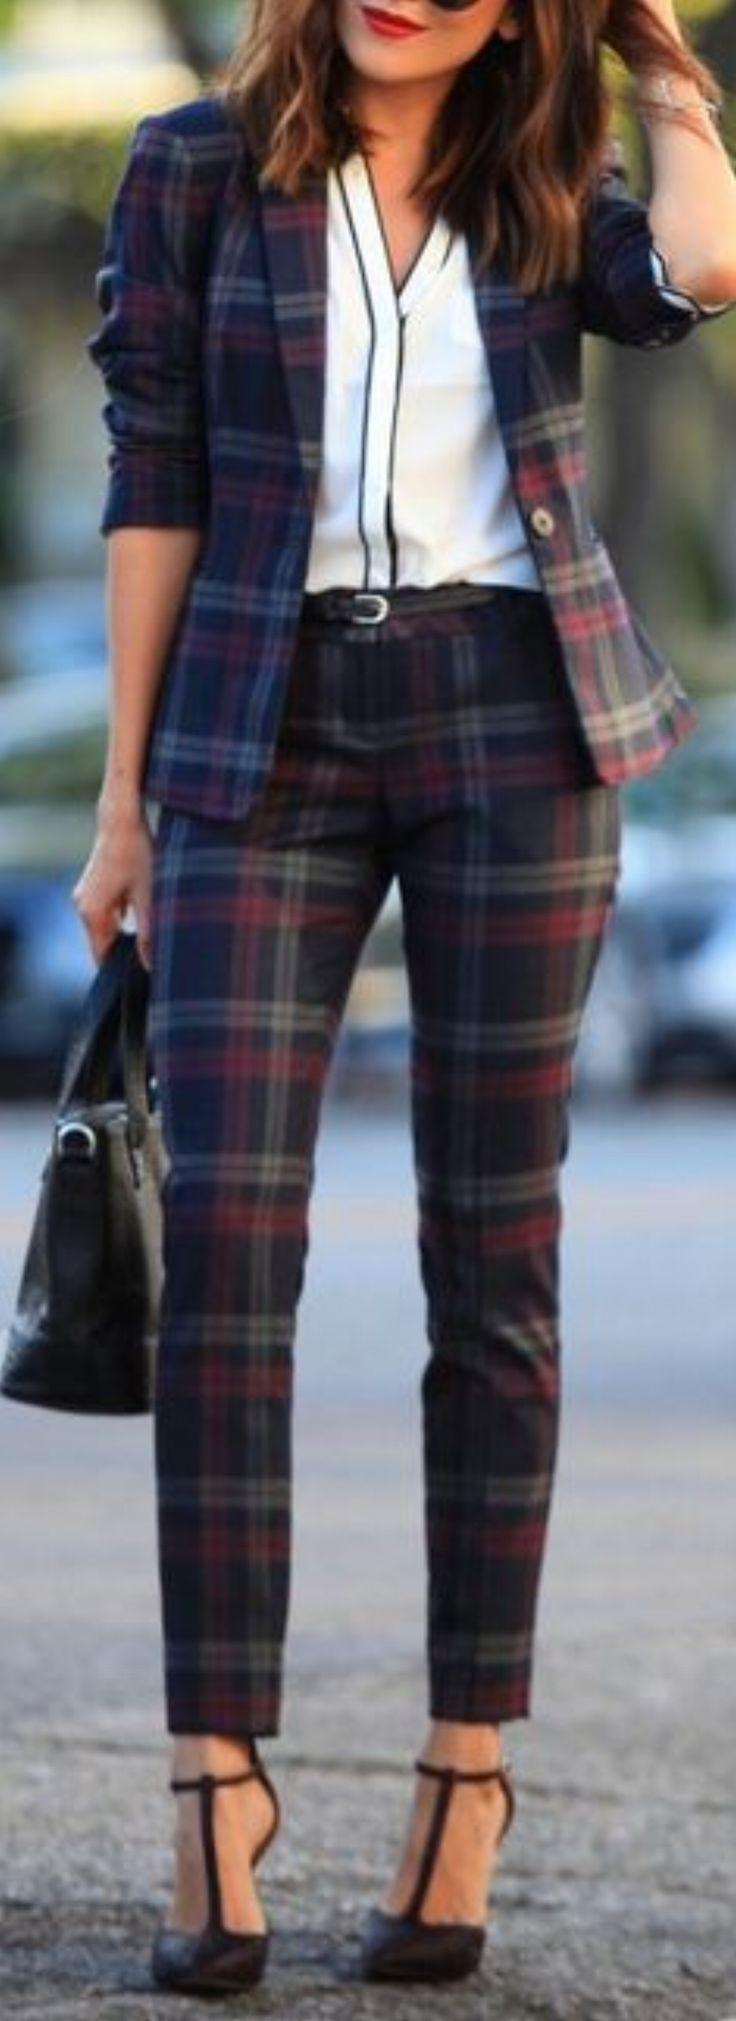 Blouse: Express Pocket Shirt   Pants: Berry Plaid Pant   Blazer: Berry Plaid Jacket